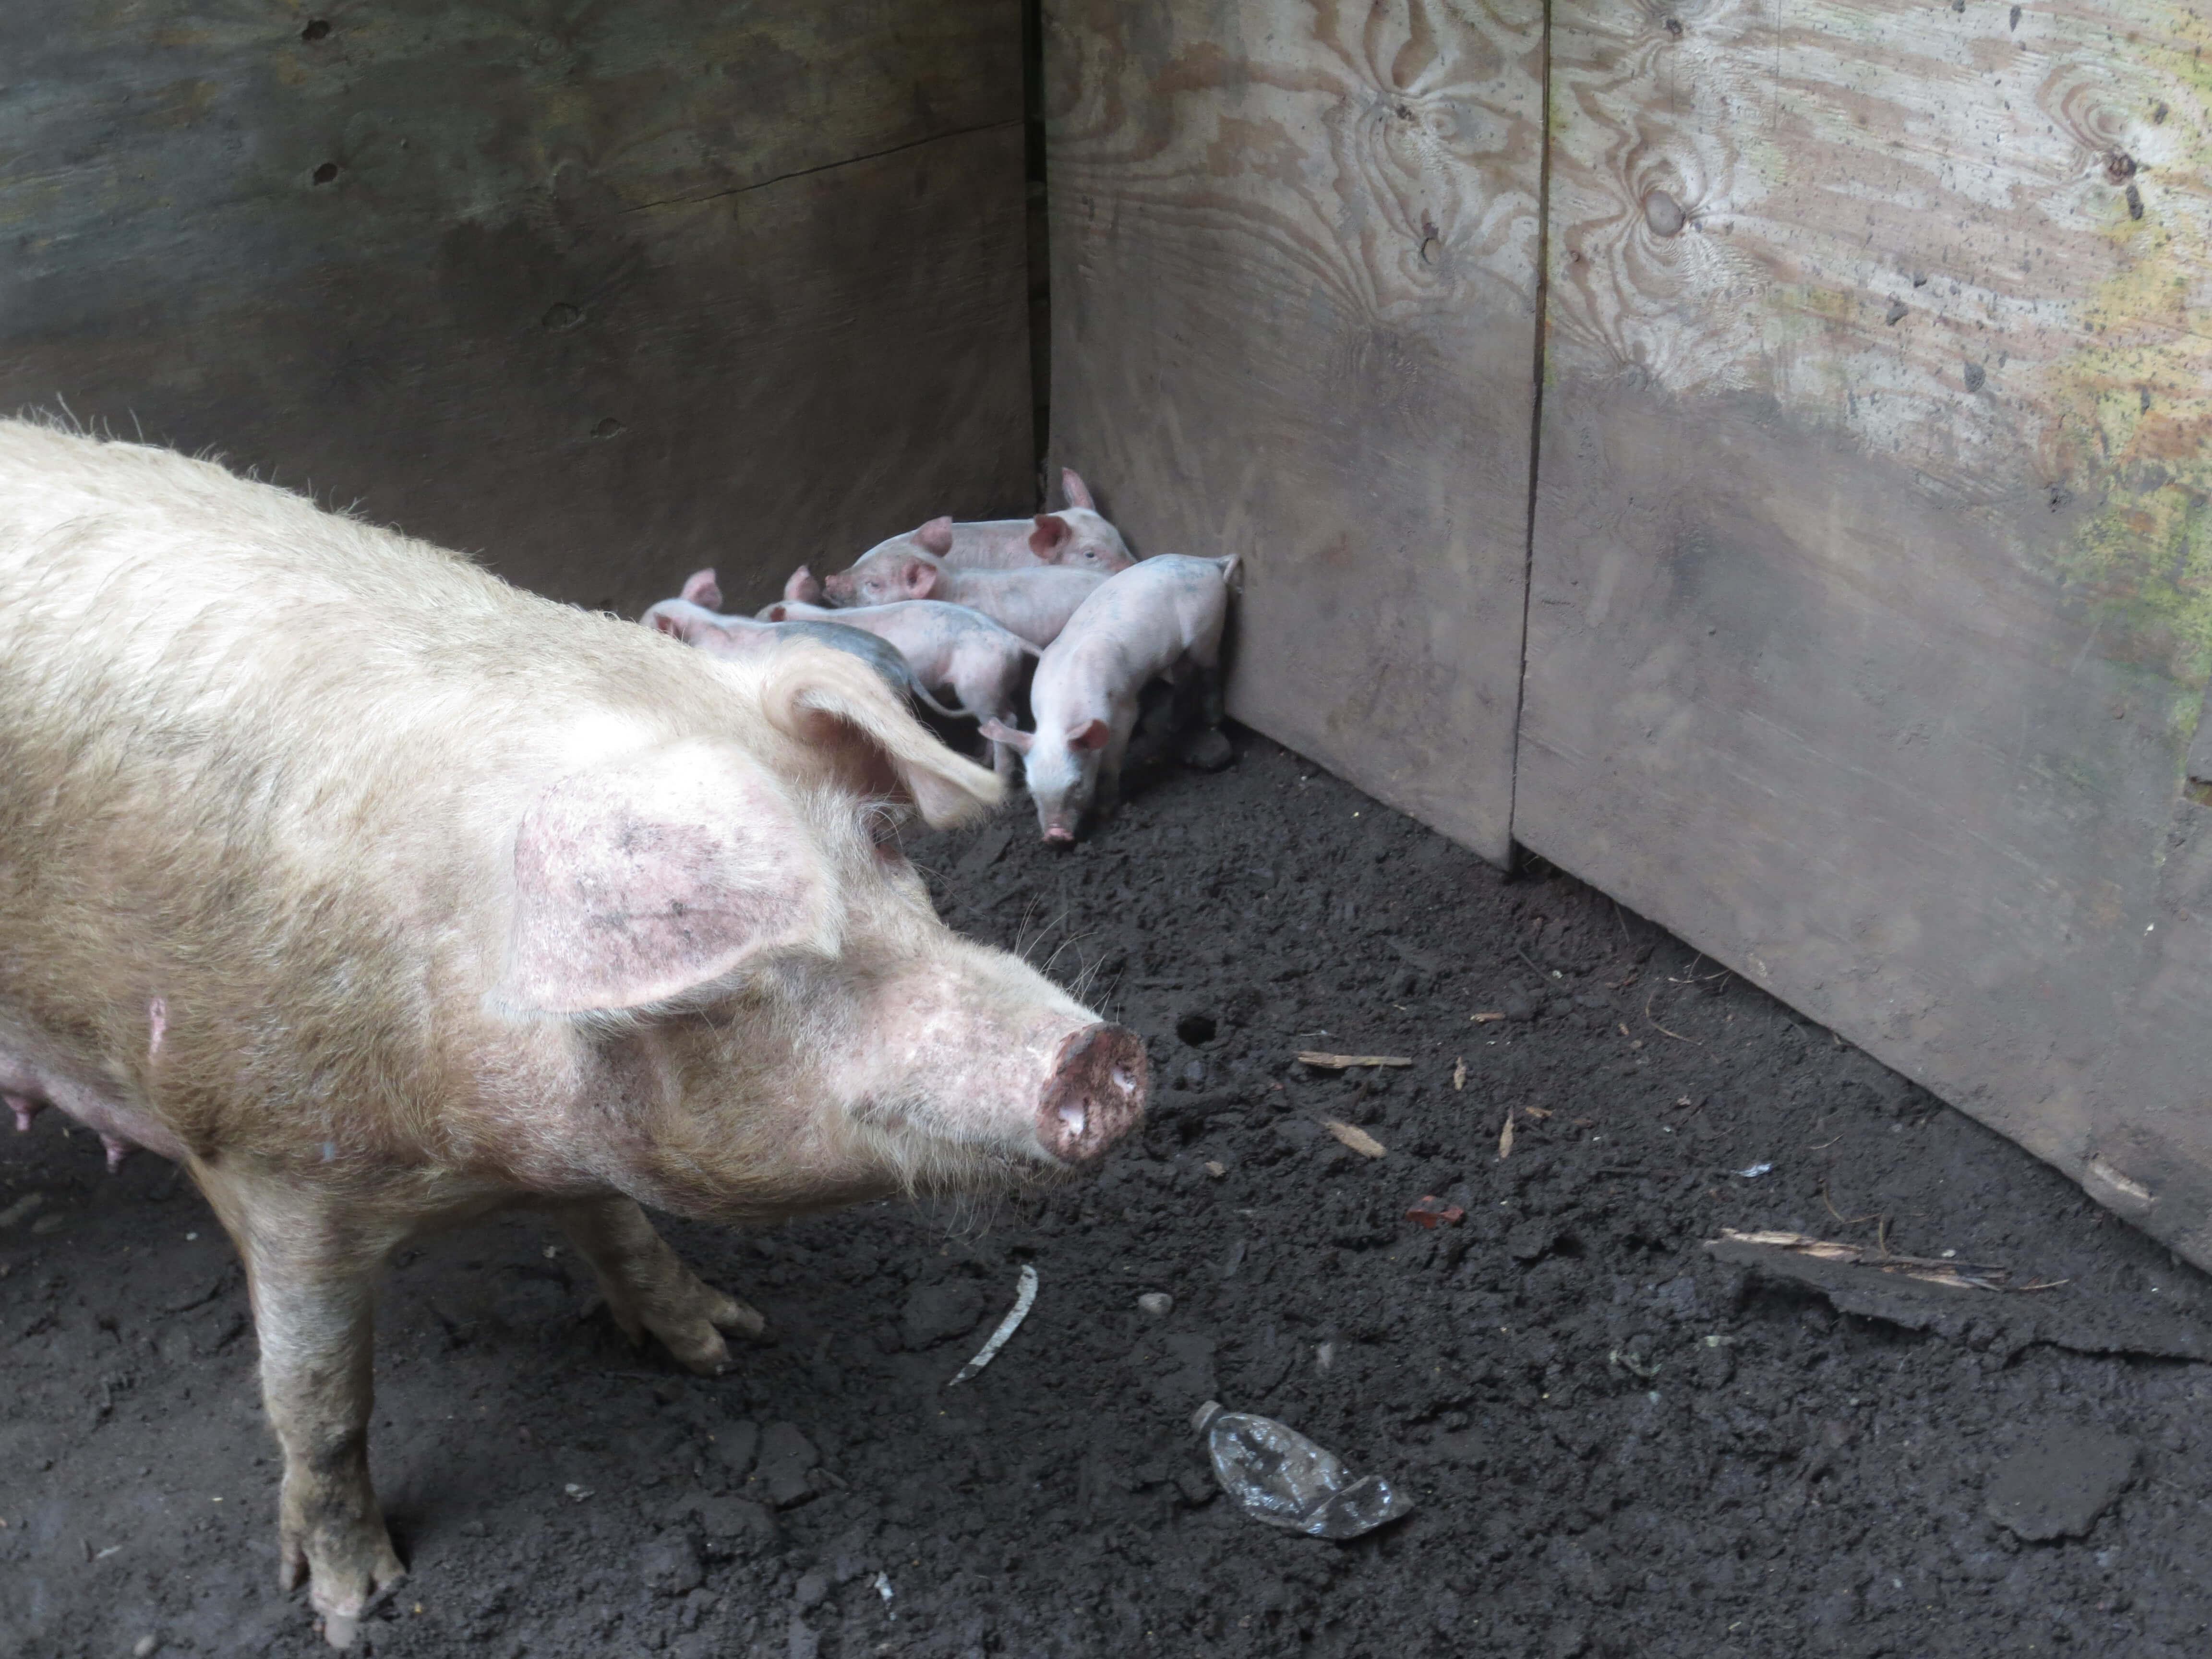 103 Governors Street, Lewiston MISC 7.10.14 JC -KK -Pigs (15)